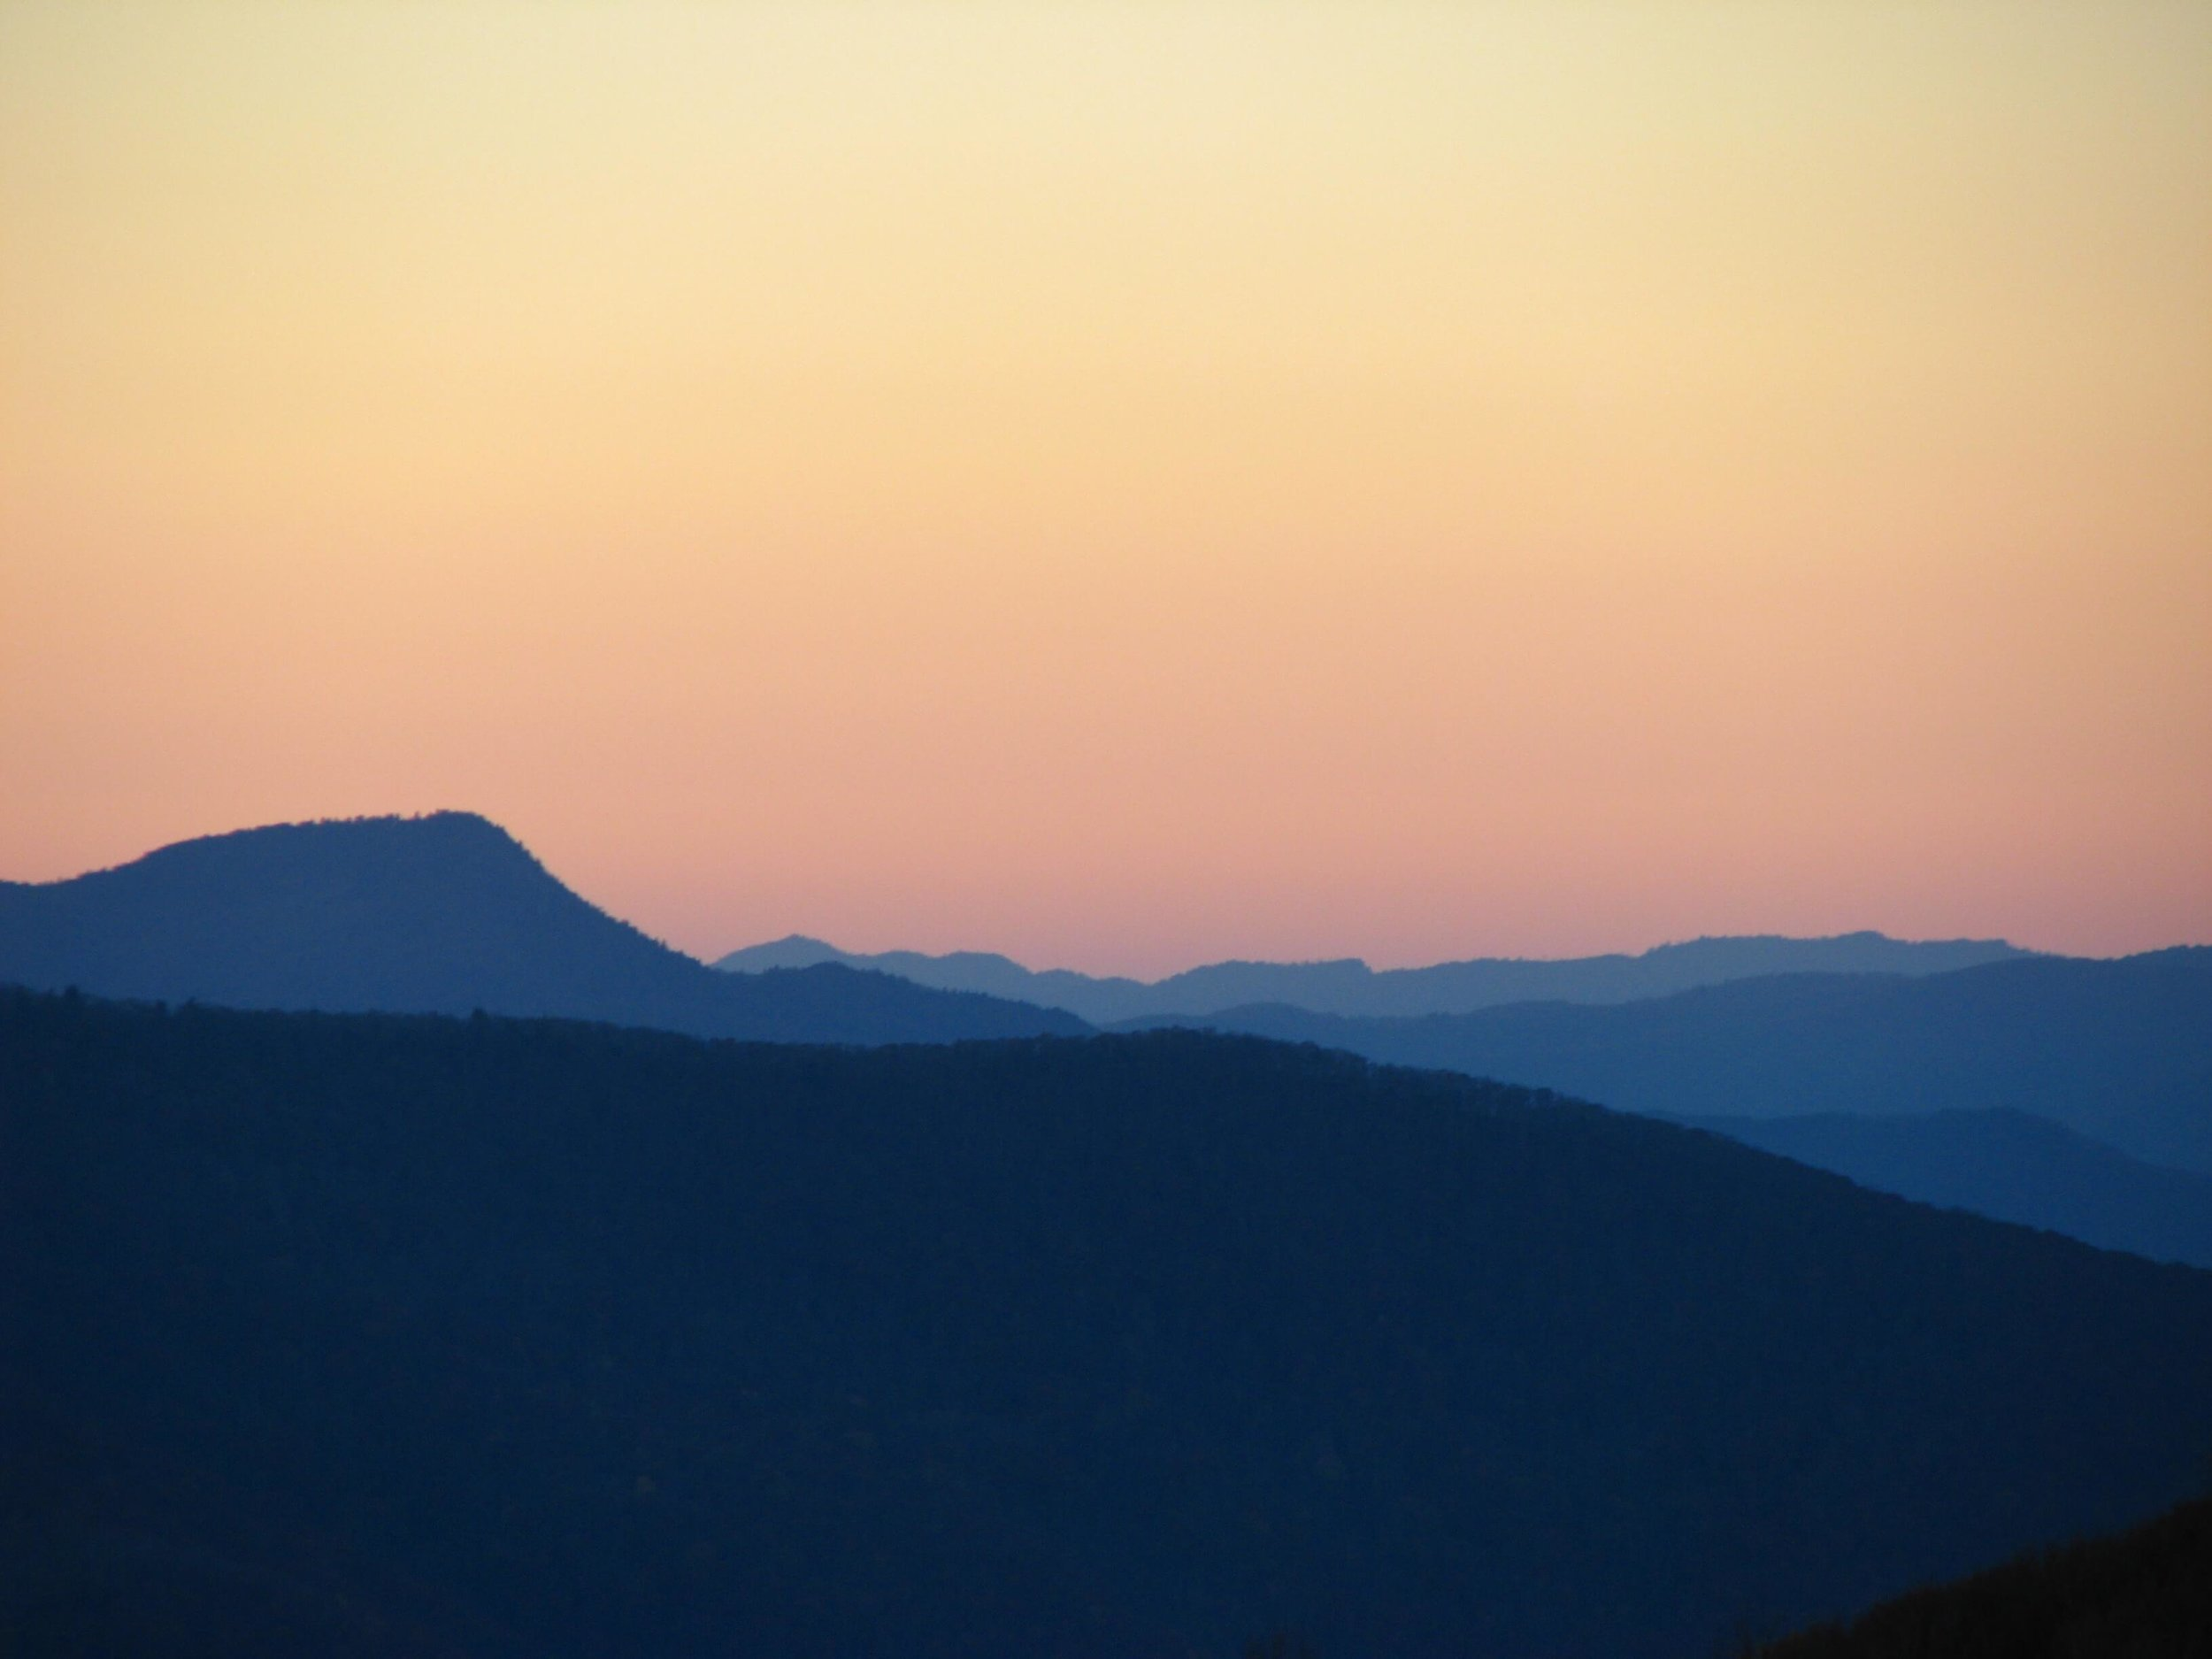 Sunset in North Carolina, photo courtesy Lauren Smith.